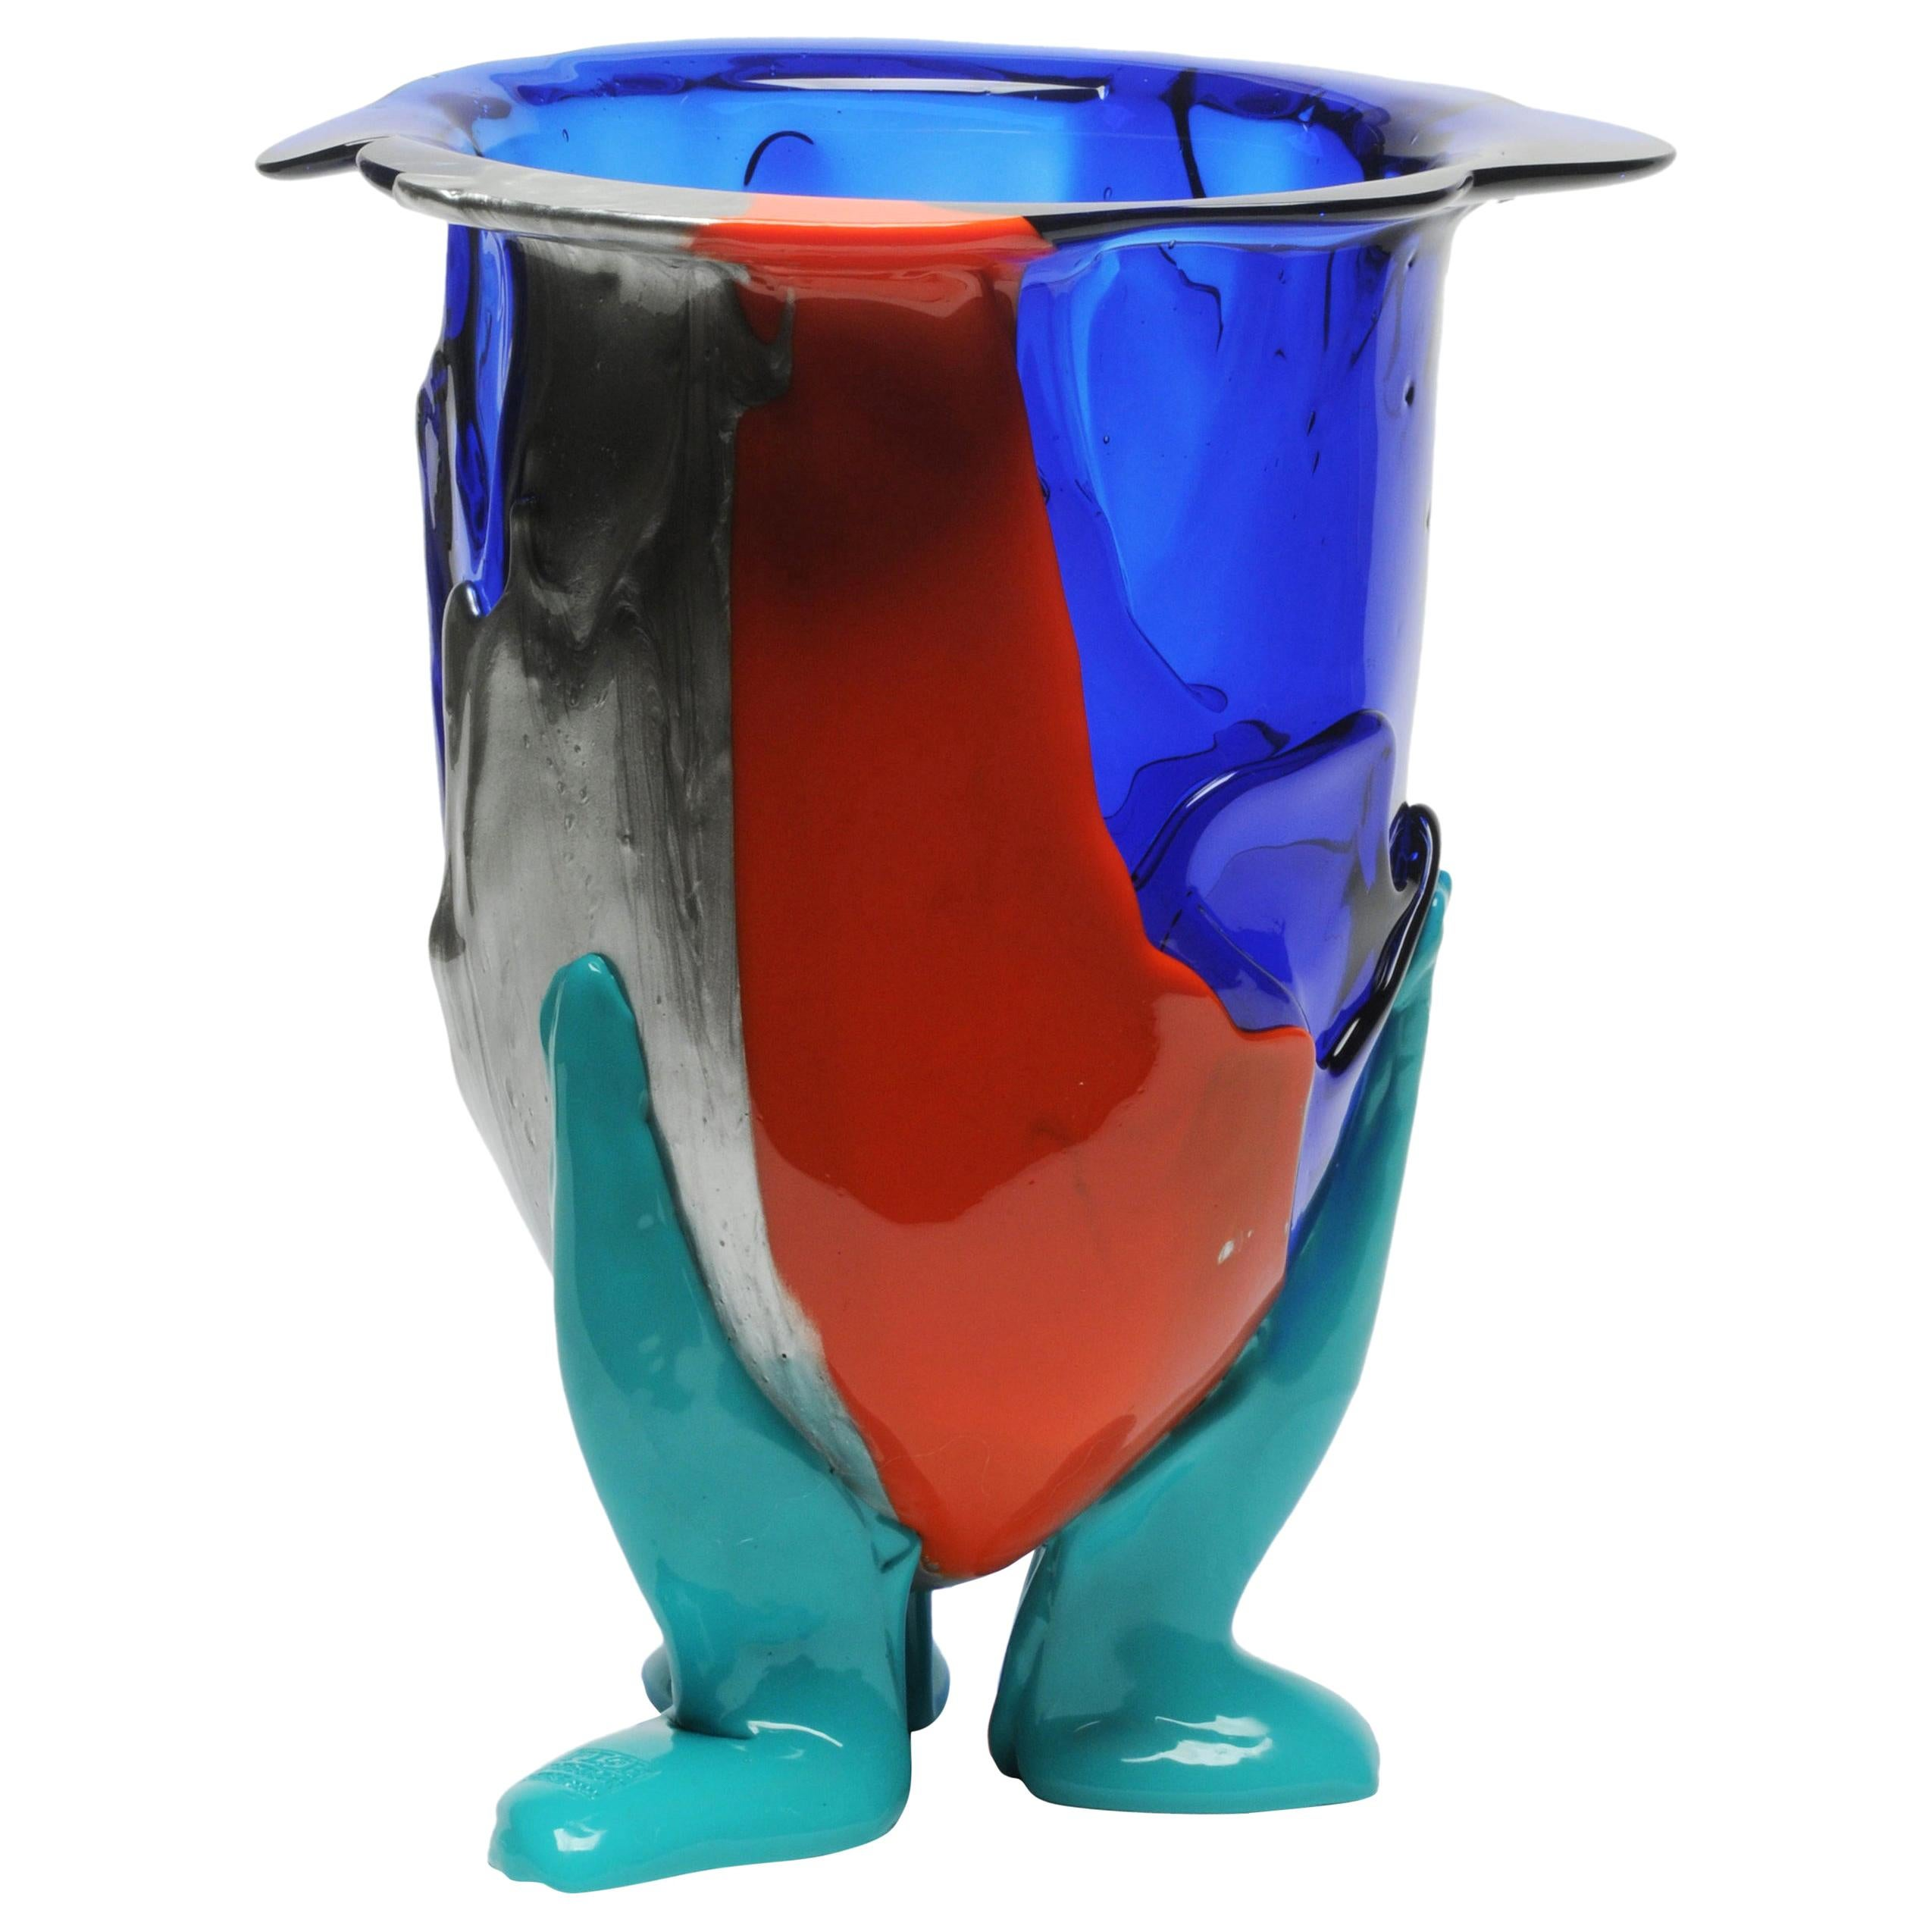 21st Century Gaetano Pesce Amazonia XL Vase Soft Resin Blue Red Turquoise Silver